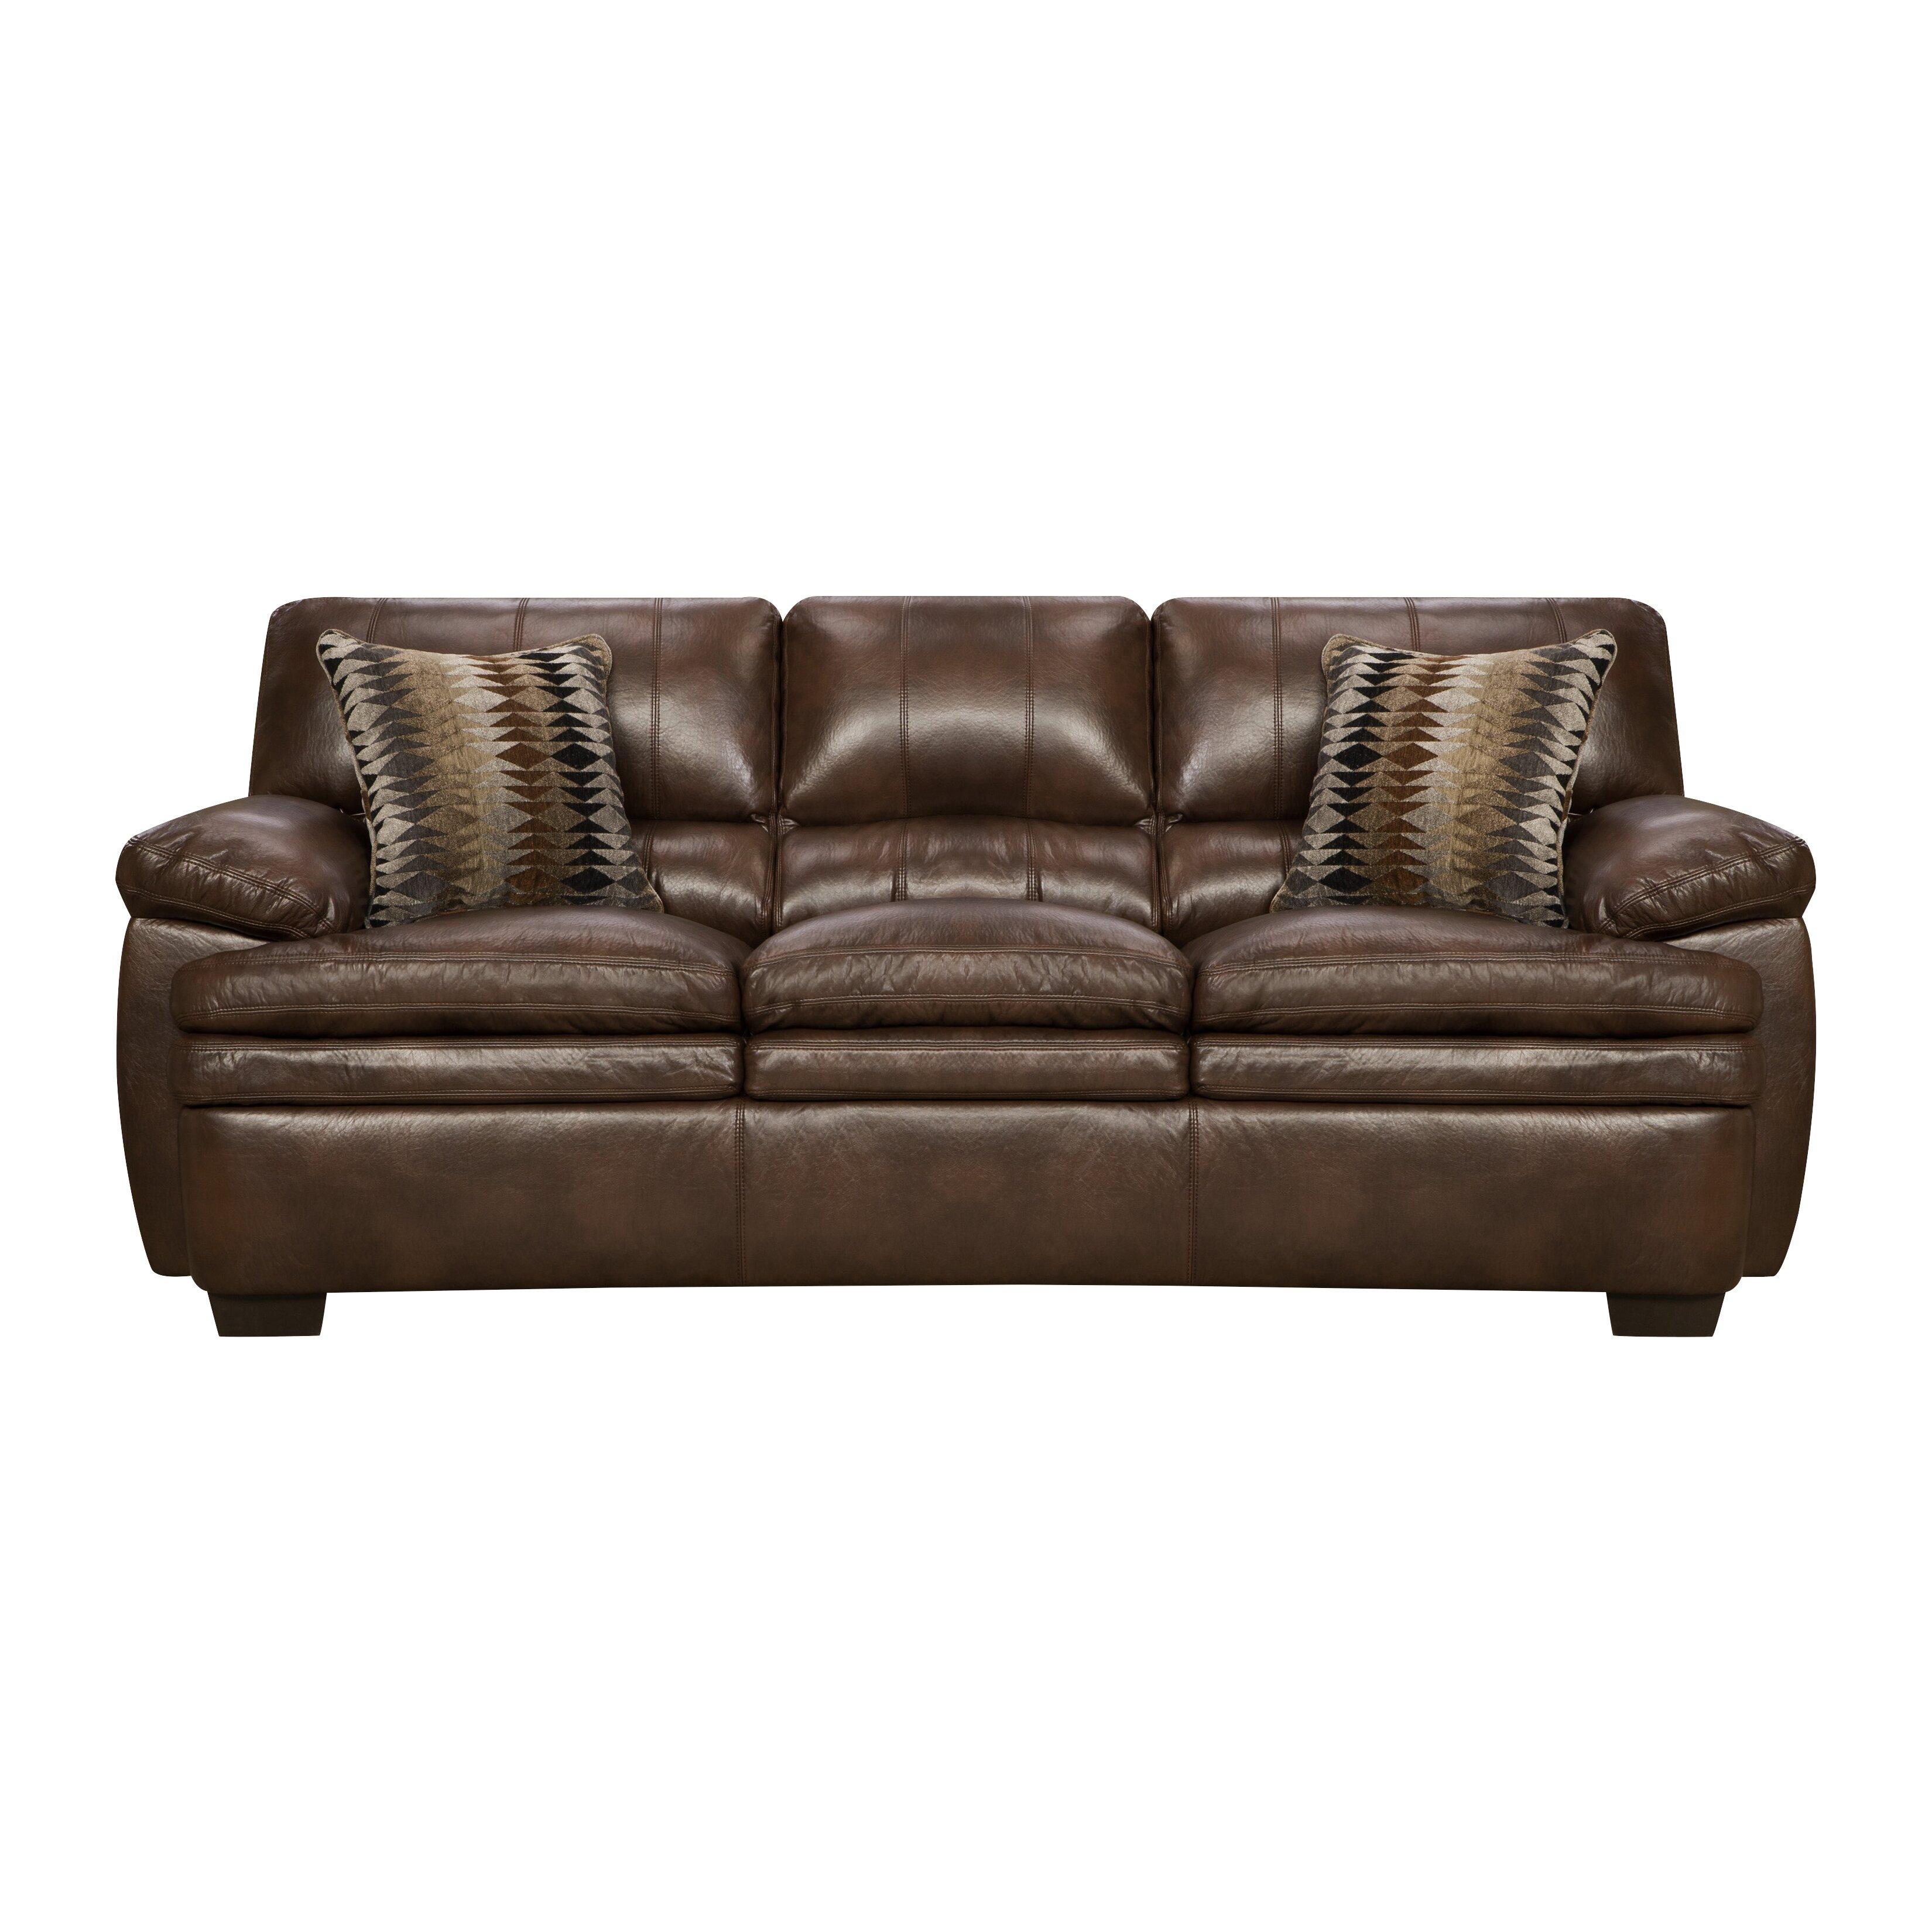 Sofa Recovering Cost Uk Sofa Hpricot